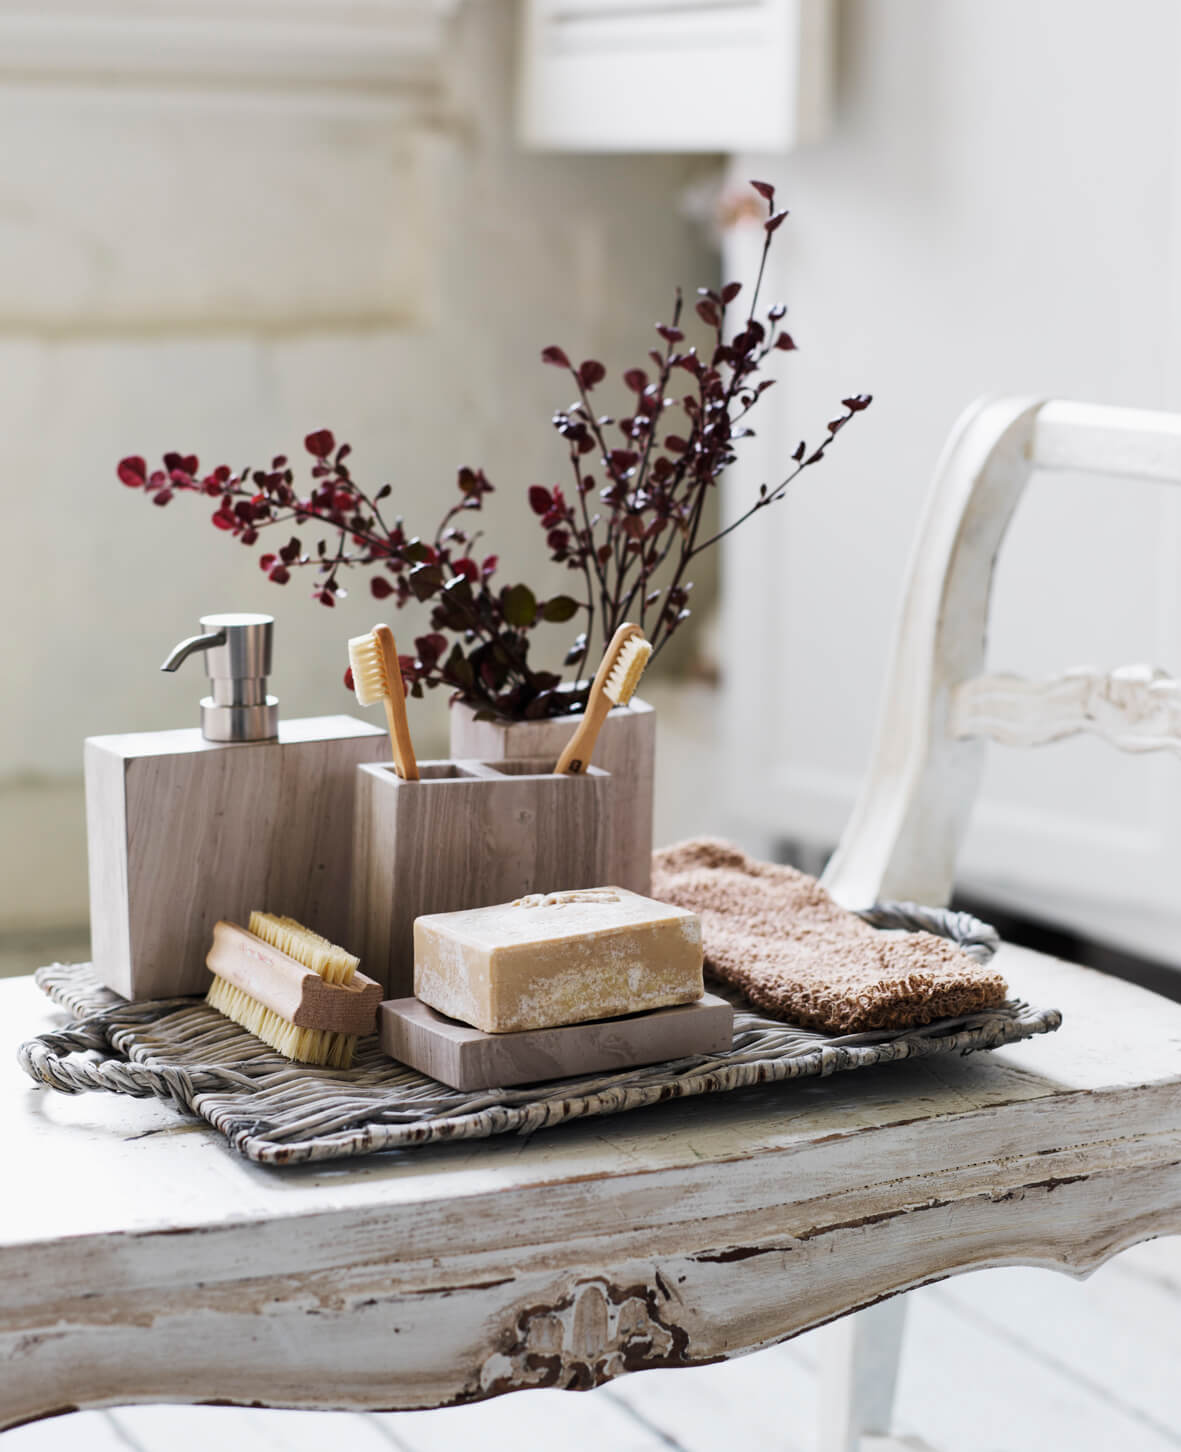 Table de salle de bain antique avec plante